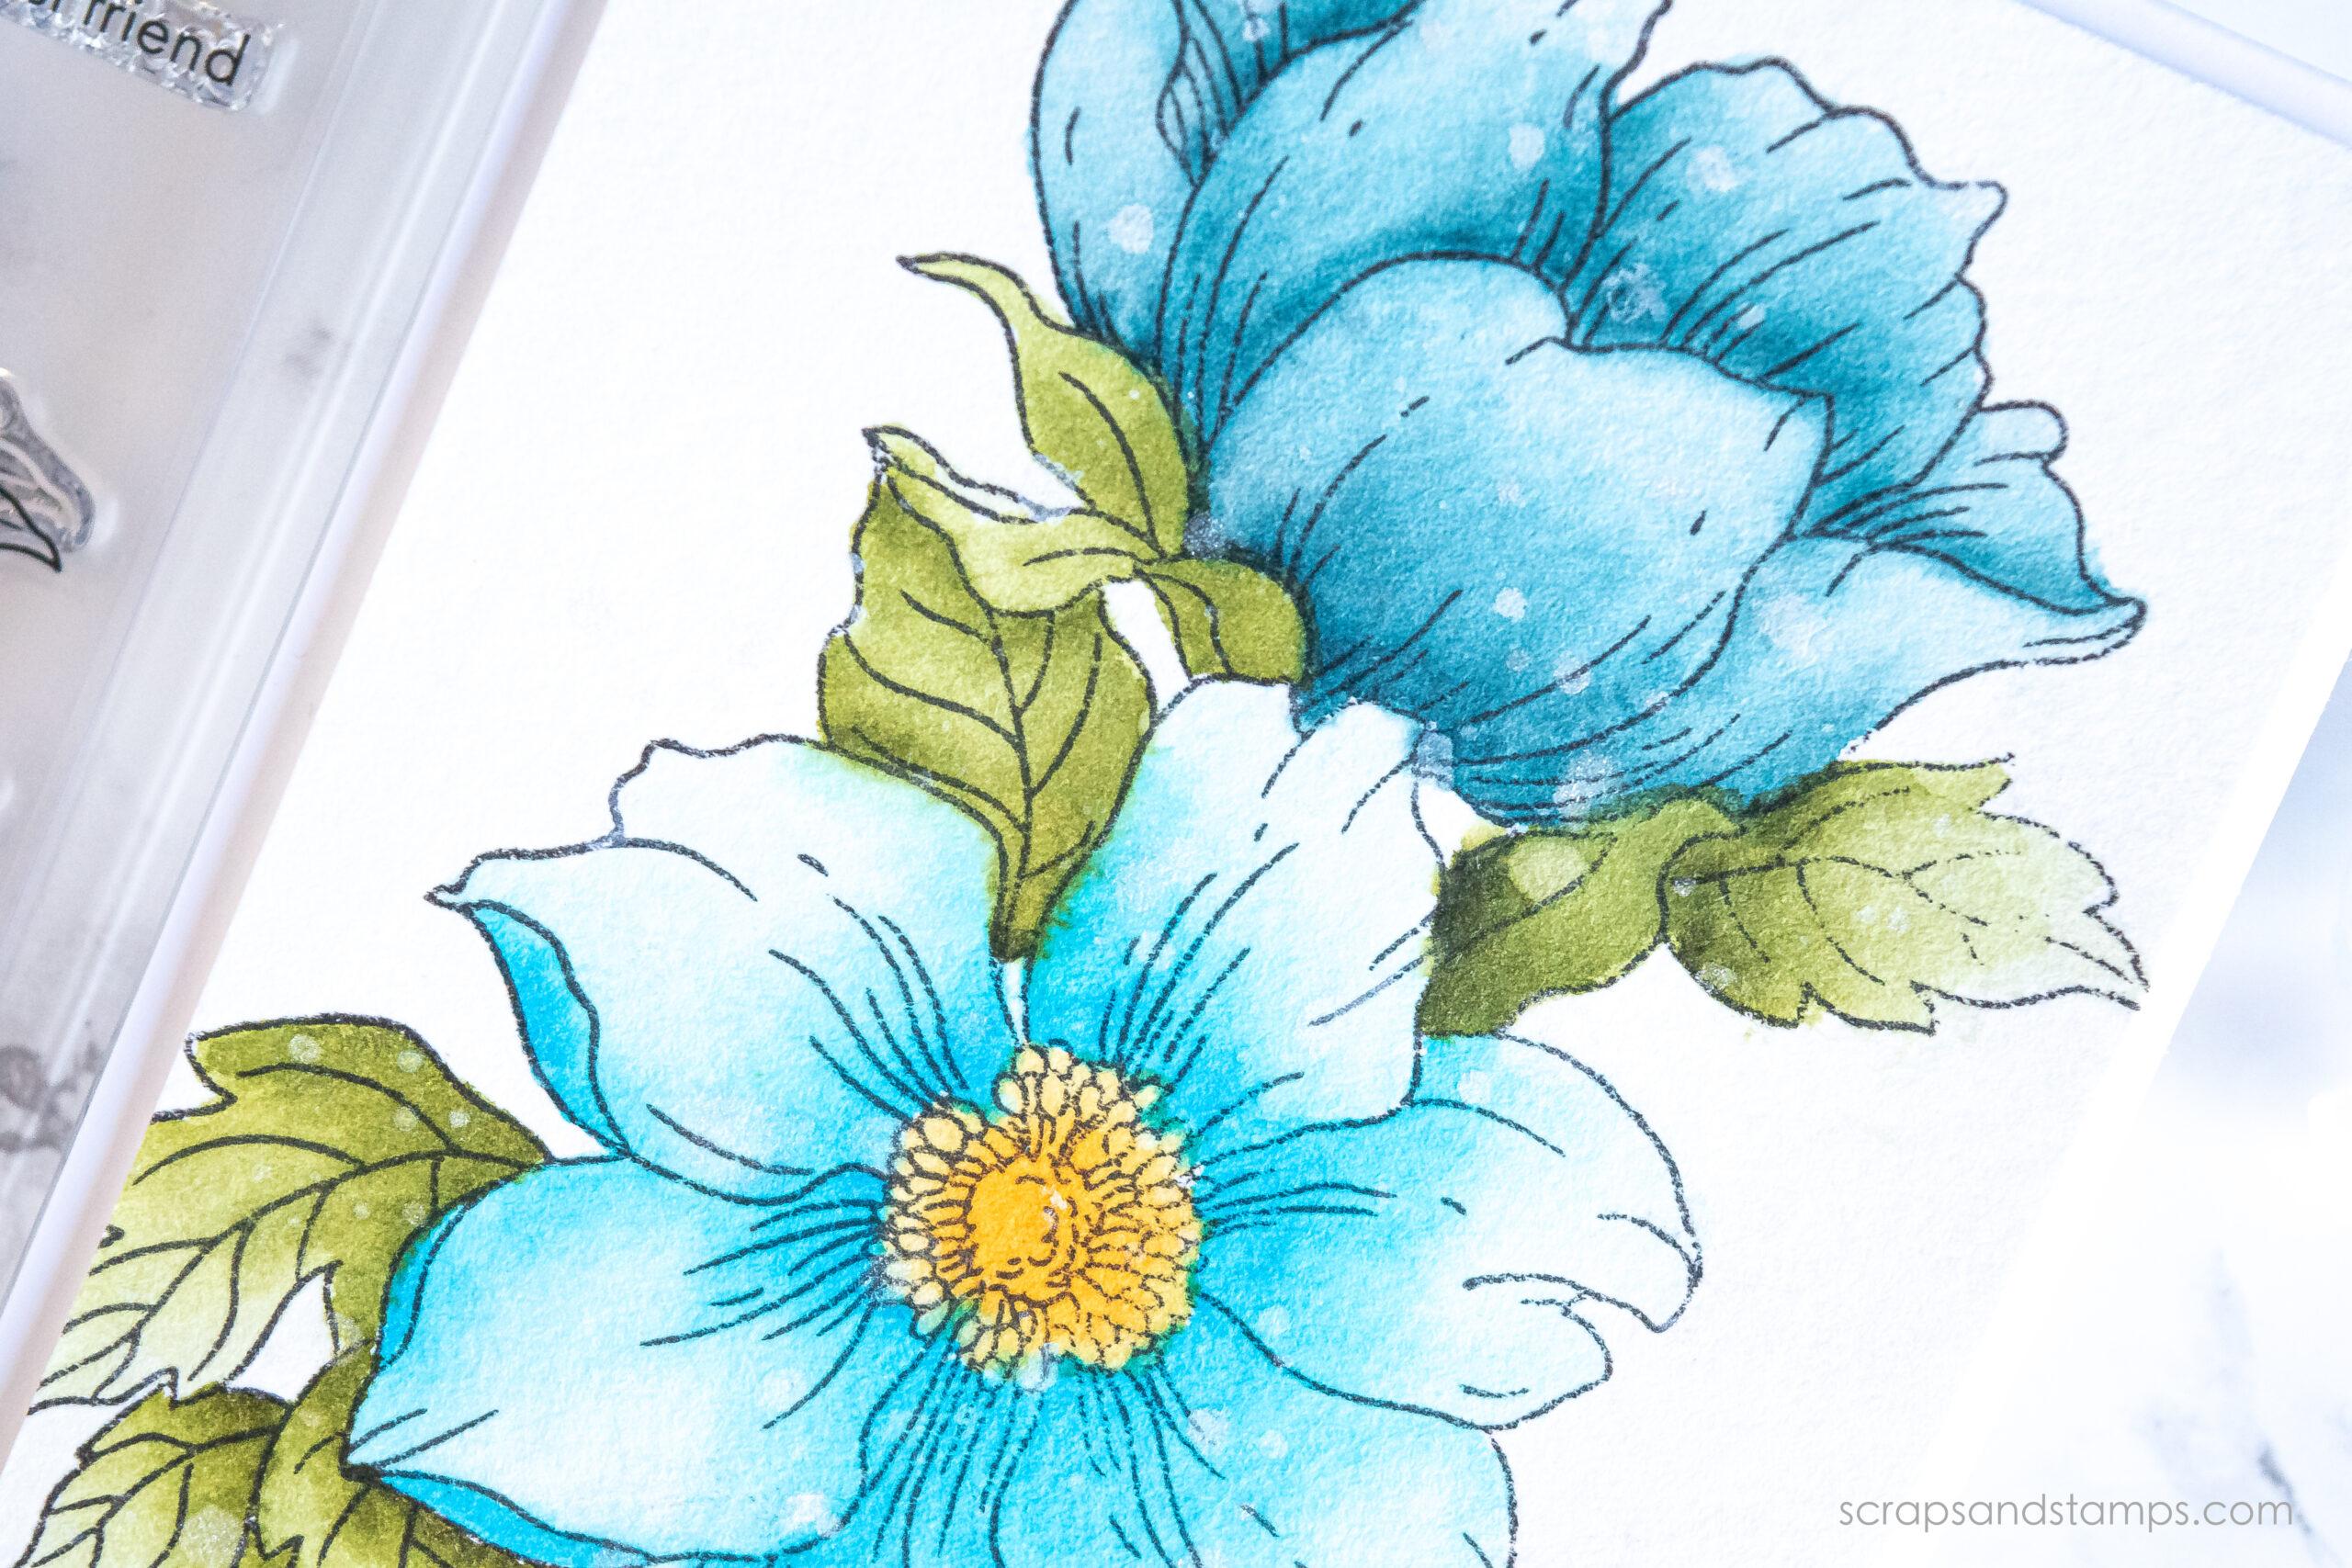 Altenew - Statement Flowers Stamp Set - Watercolor Brush Markers - Nicole Picadura-12